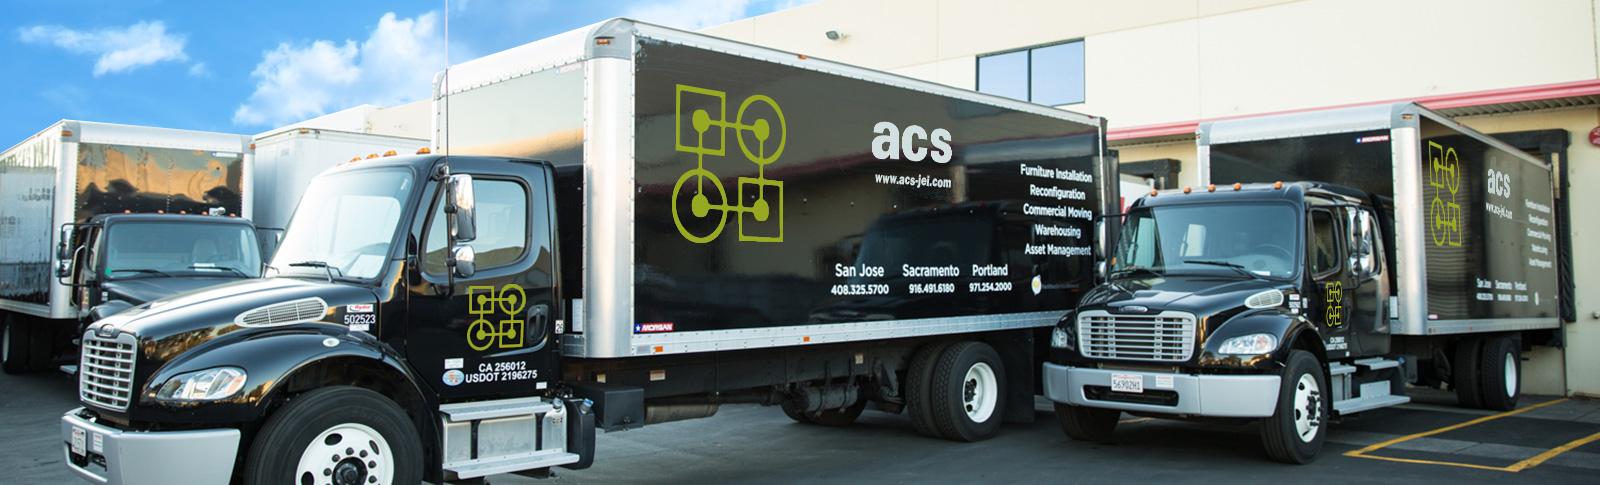 ACS - Transportation Services